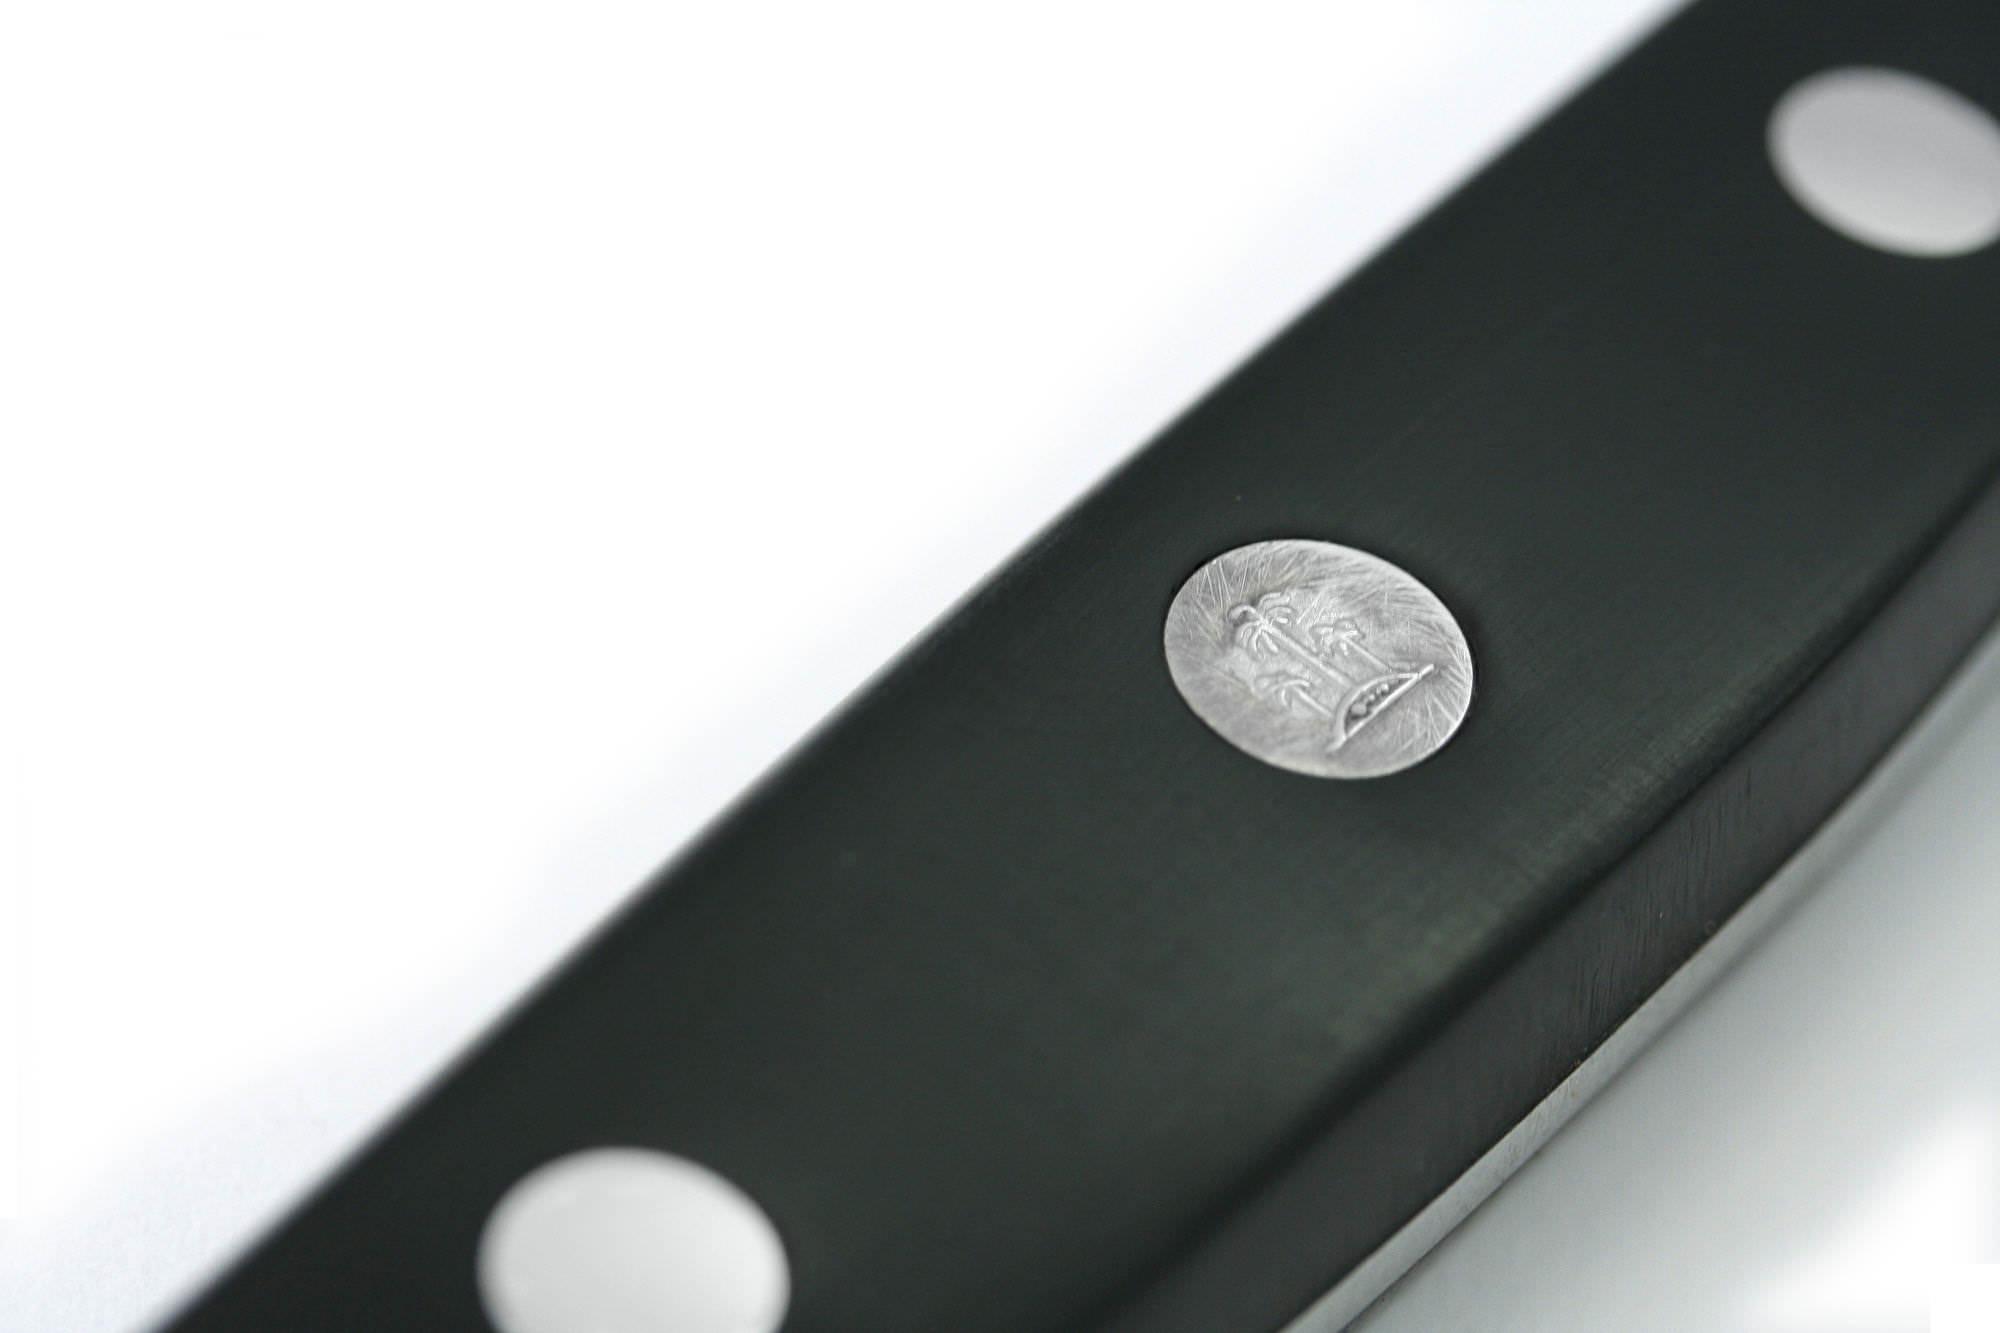 Güde Hackmesser Alpha 18 cm